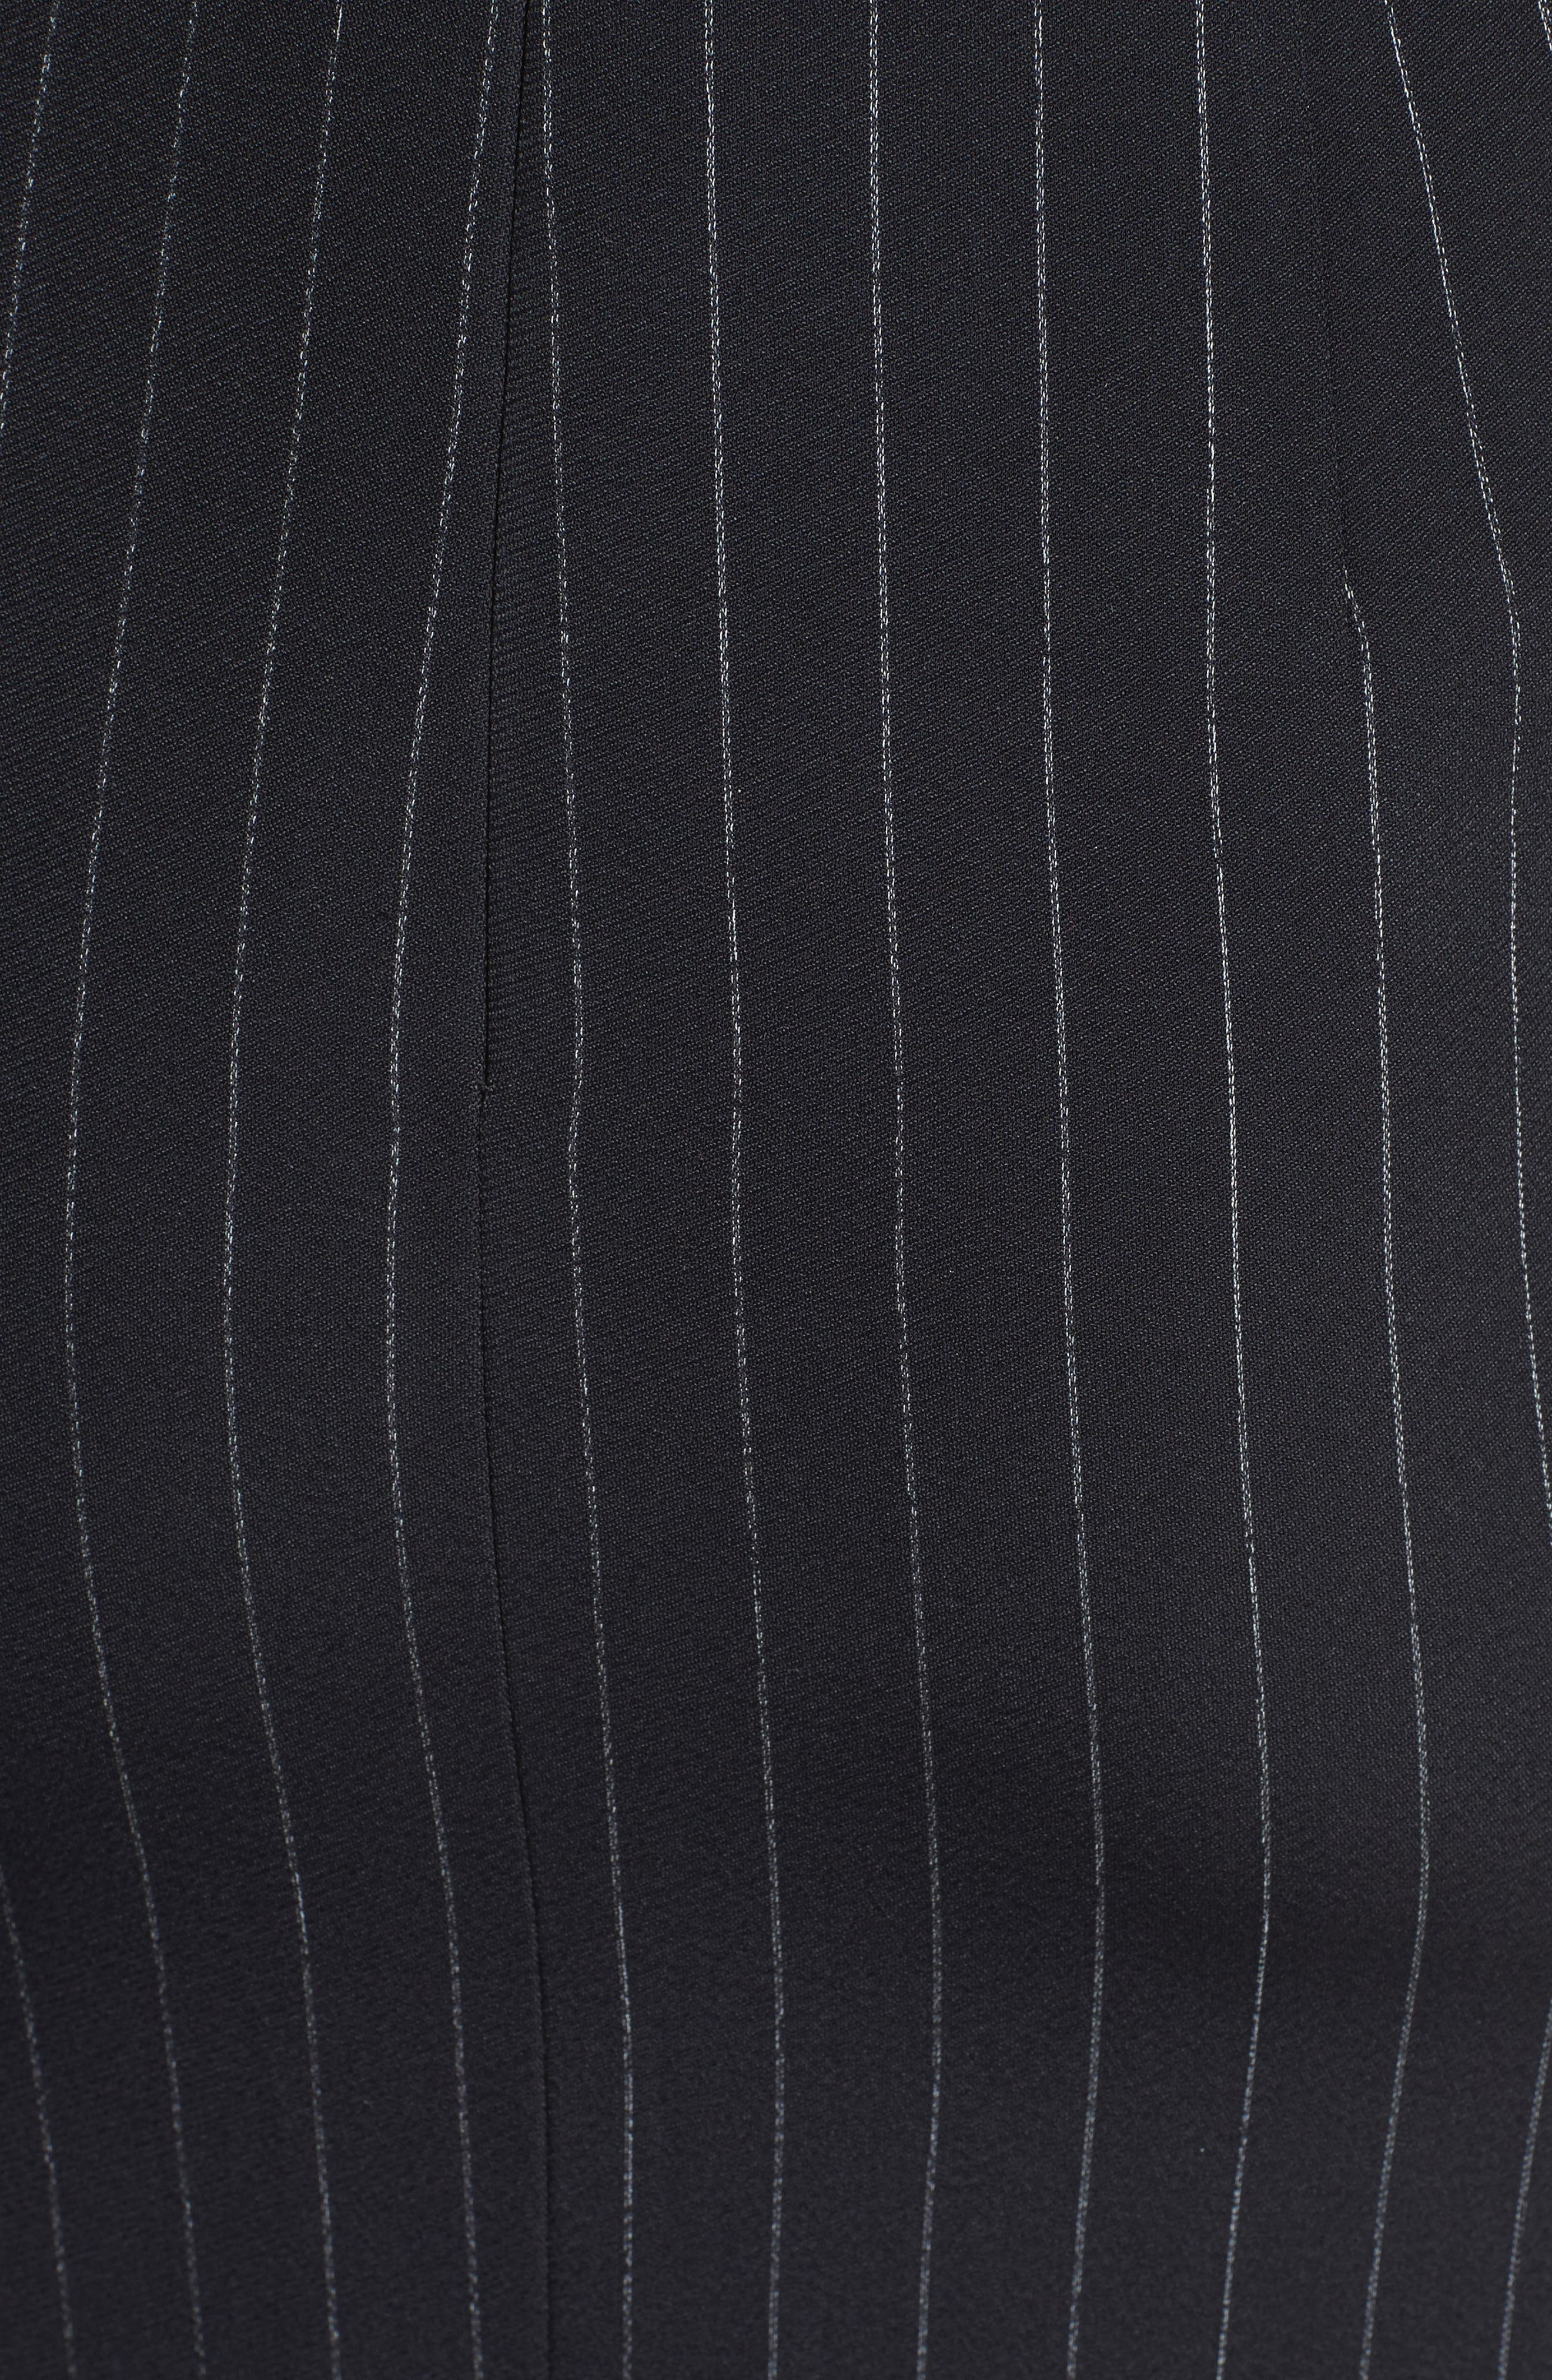 Pinstripe Stretch Dress,                             Alternate thumbnail 5, color,                             001